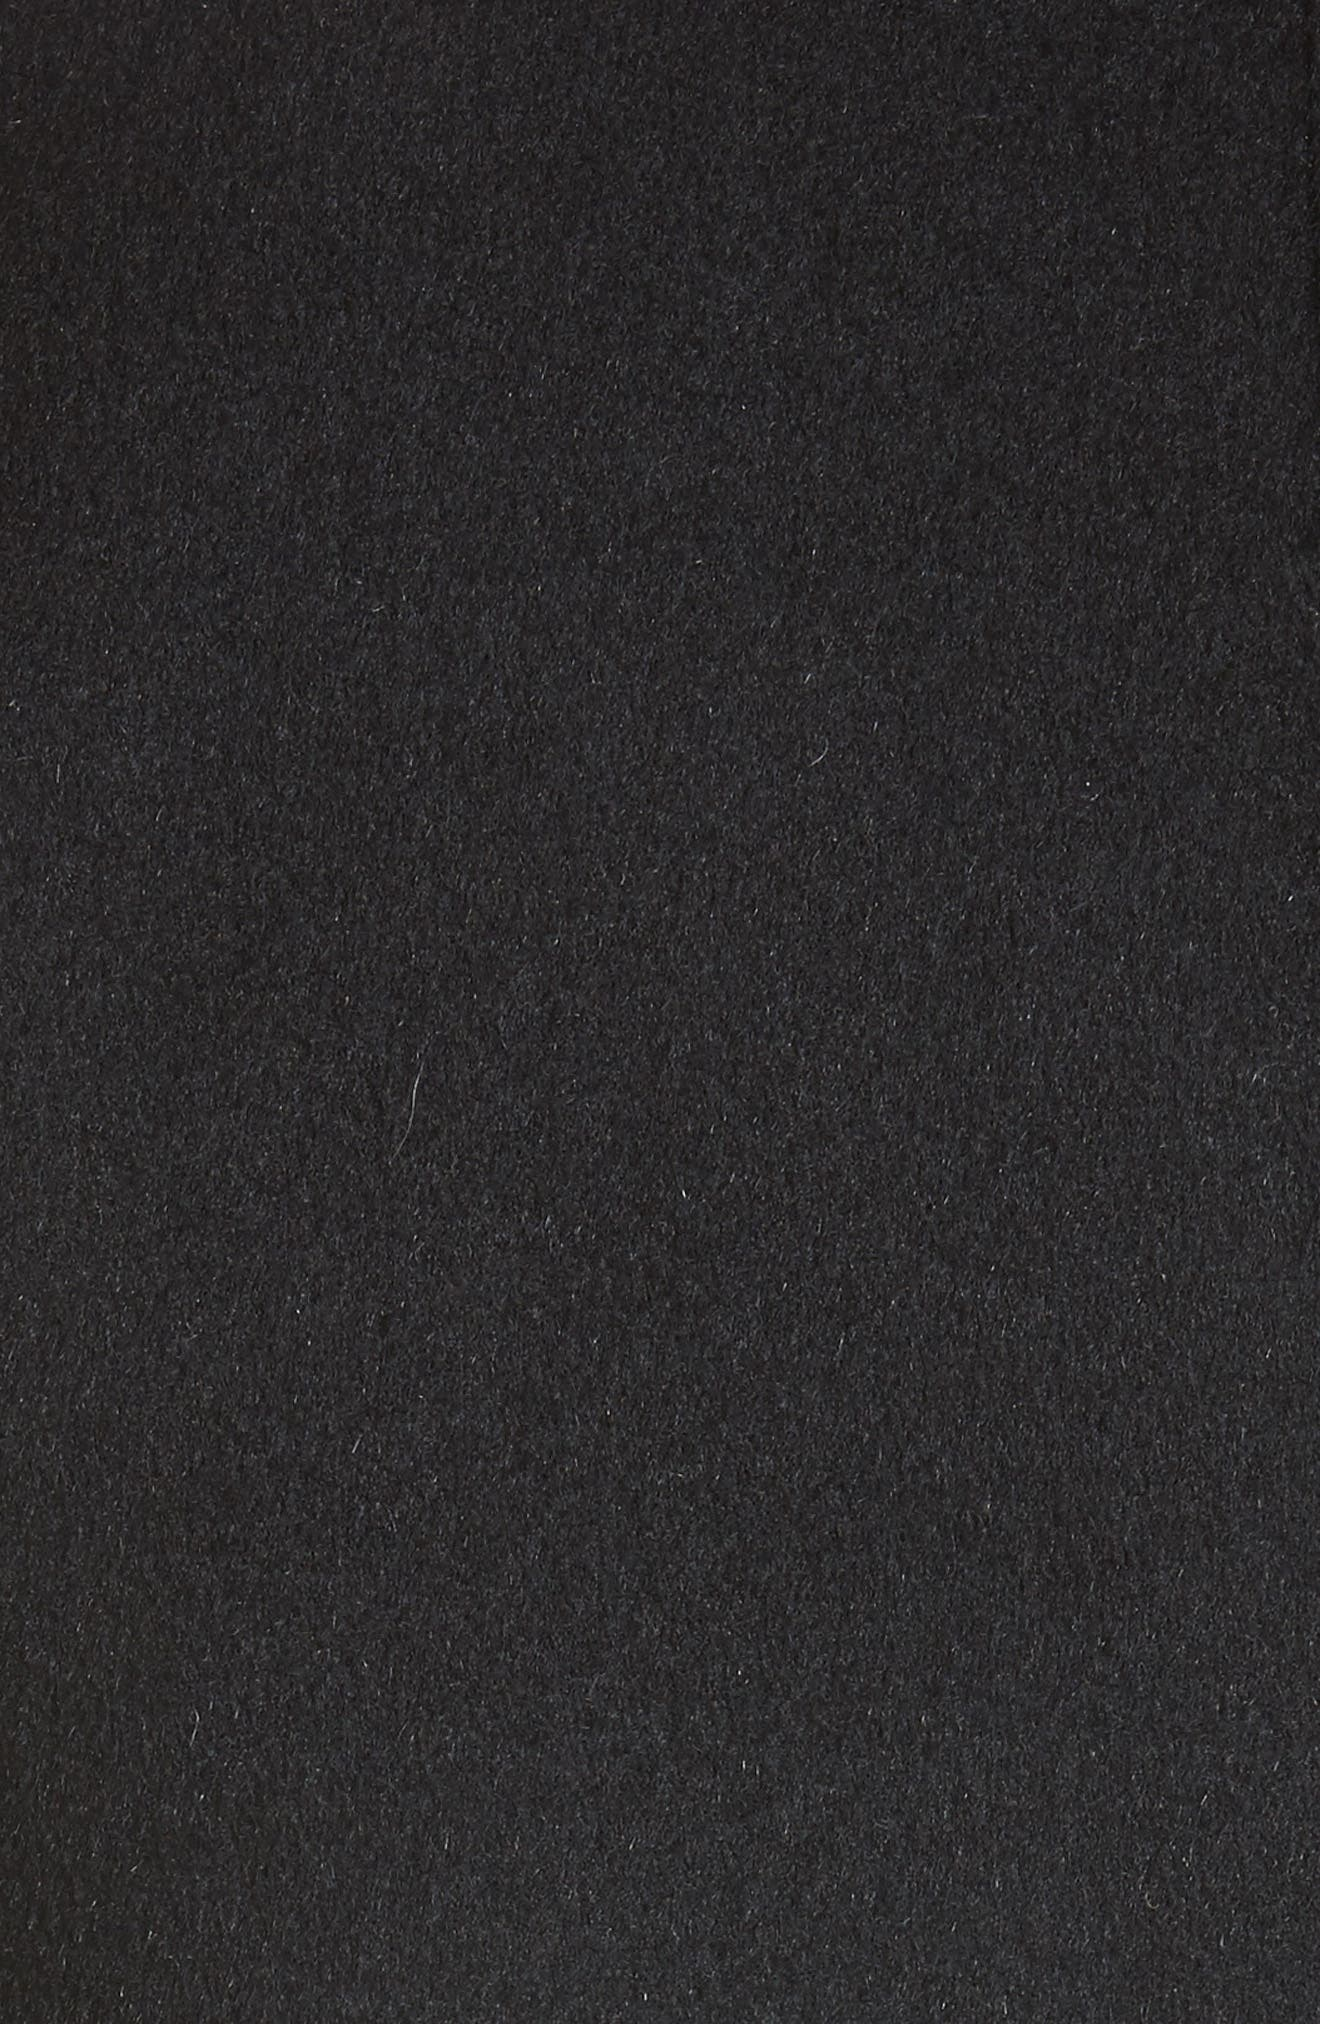 Genuine Fox Fur Trim Wool Blend Jacket,                             Alternate thumbnail 6, color,                             001